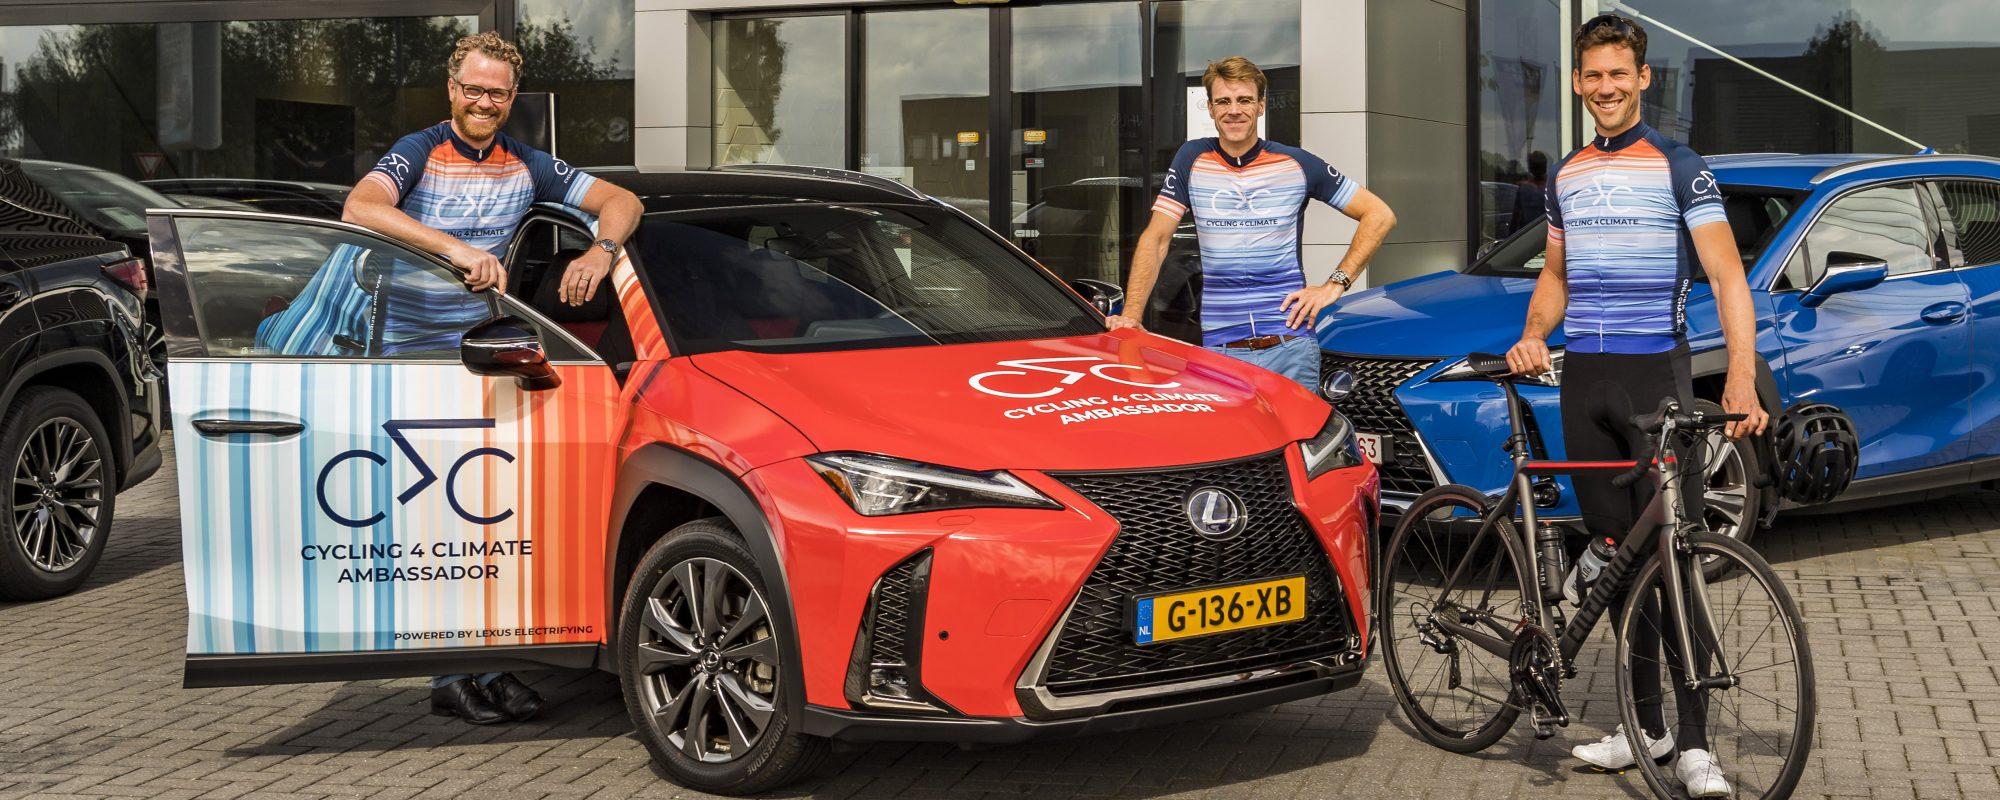 Duurzame match: Cycling 4 Climate-ambassadeur Maarten Tjallingii stapt in Lexus UX Hybrid